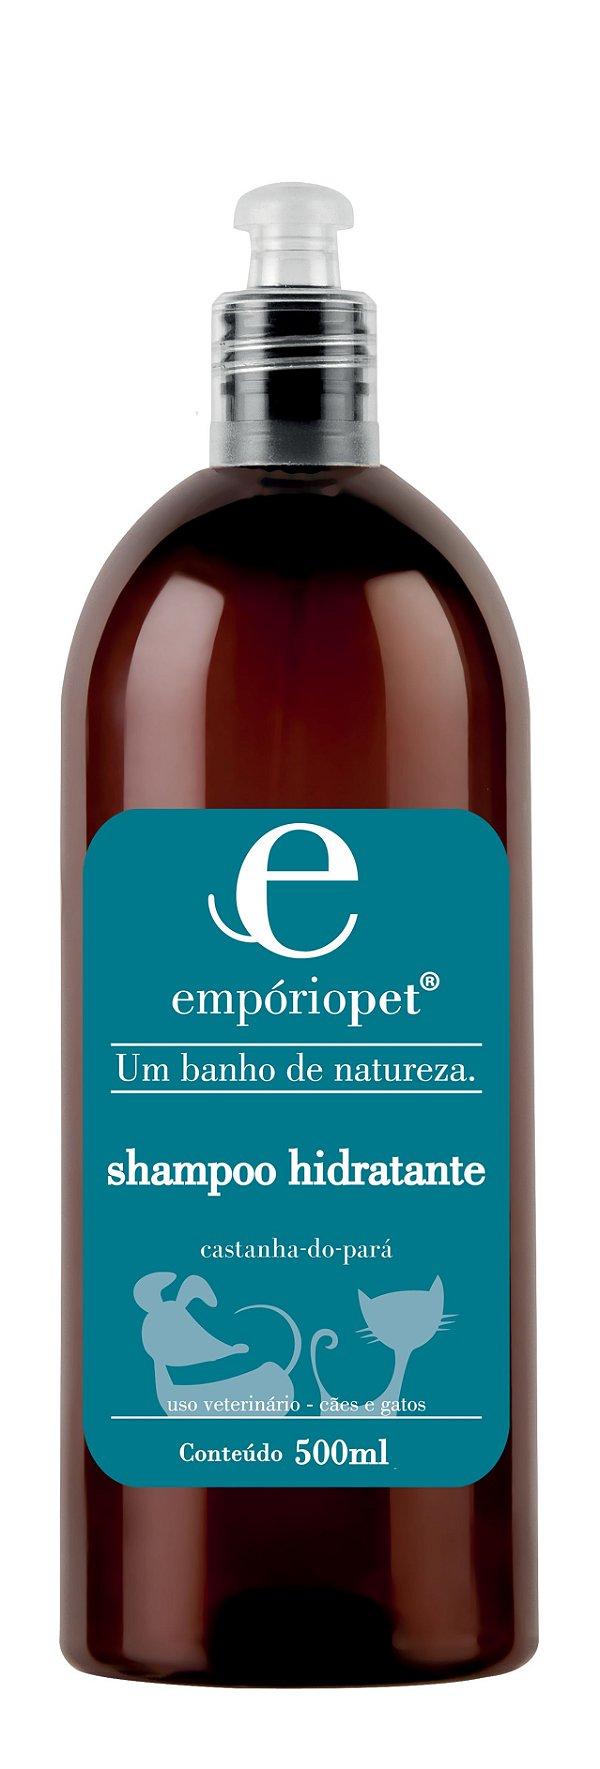 Shampoo Hidratante Empóriopet